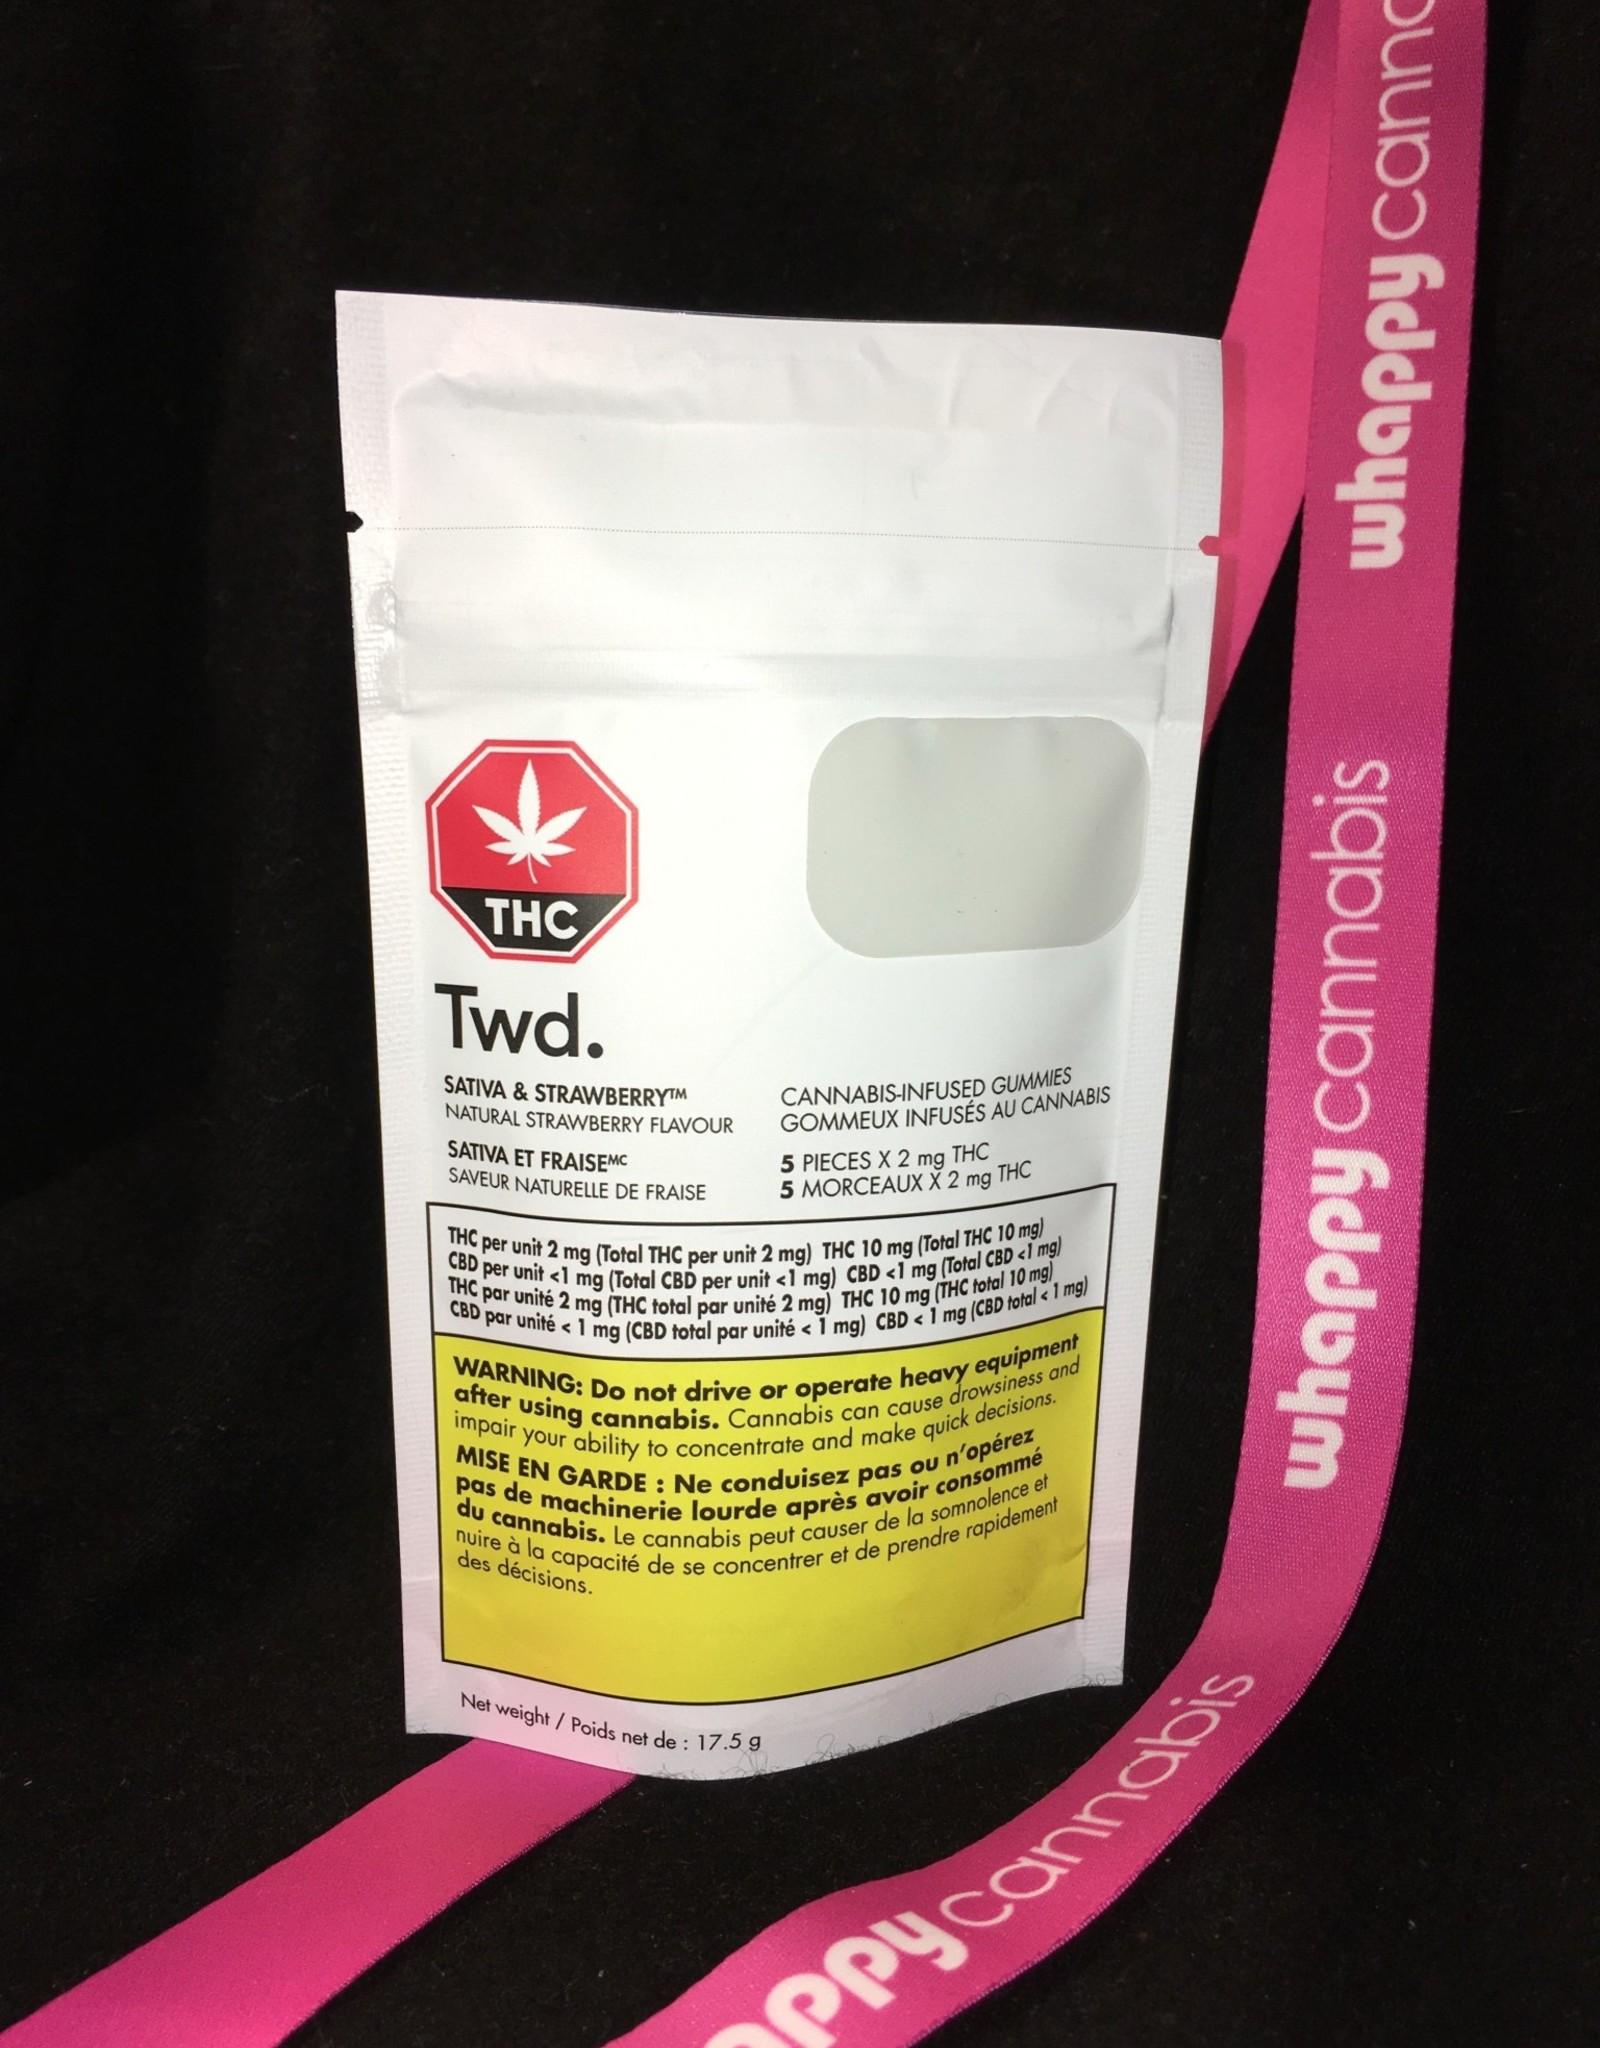 Twd. Twd. - THC Sativa & Strawberry Soft Chew 17.5g (5pc)